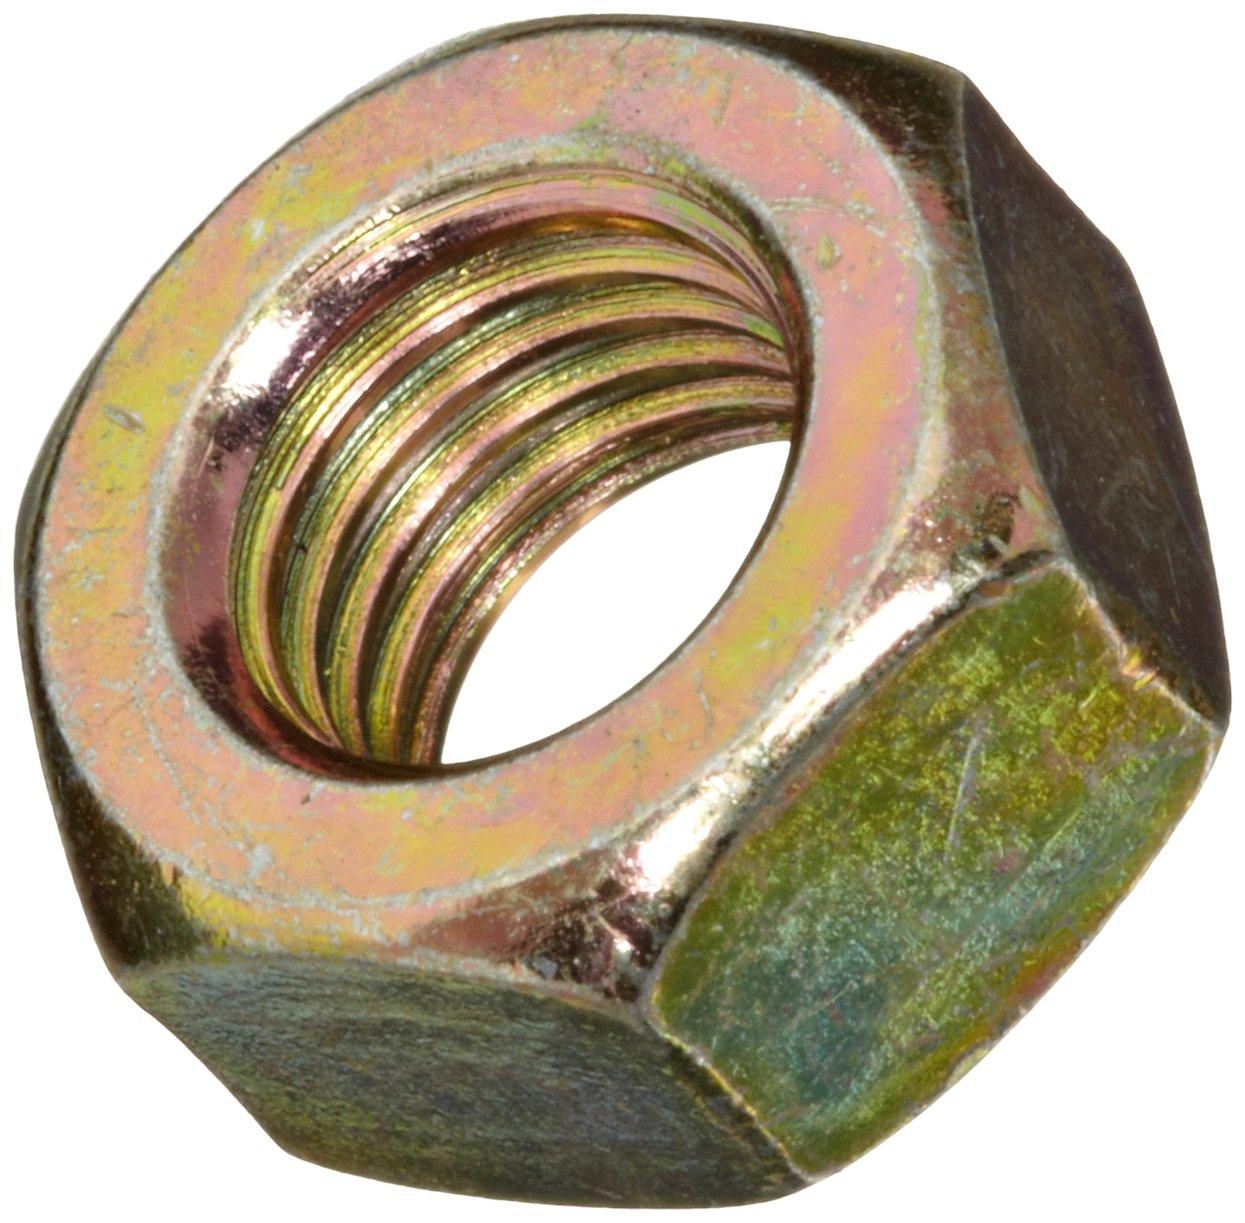 Plain Finish 1-9//32 Thick 2-1//4 Width Across Flats ASME B18.2.2 Grade 8 Steel Hex Nut 1-1//2-6 Thread Size